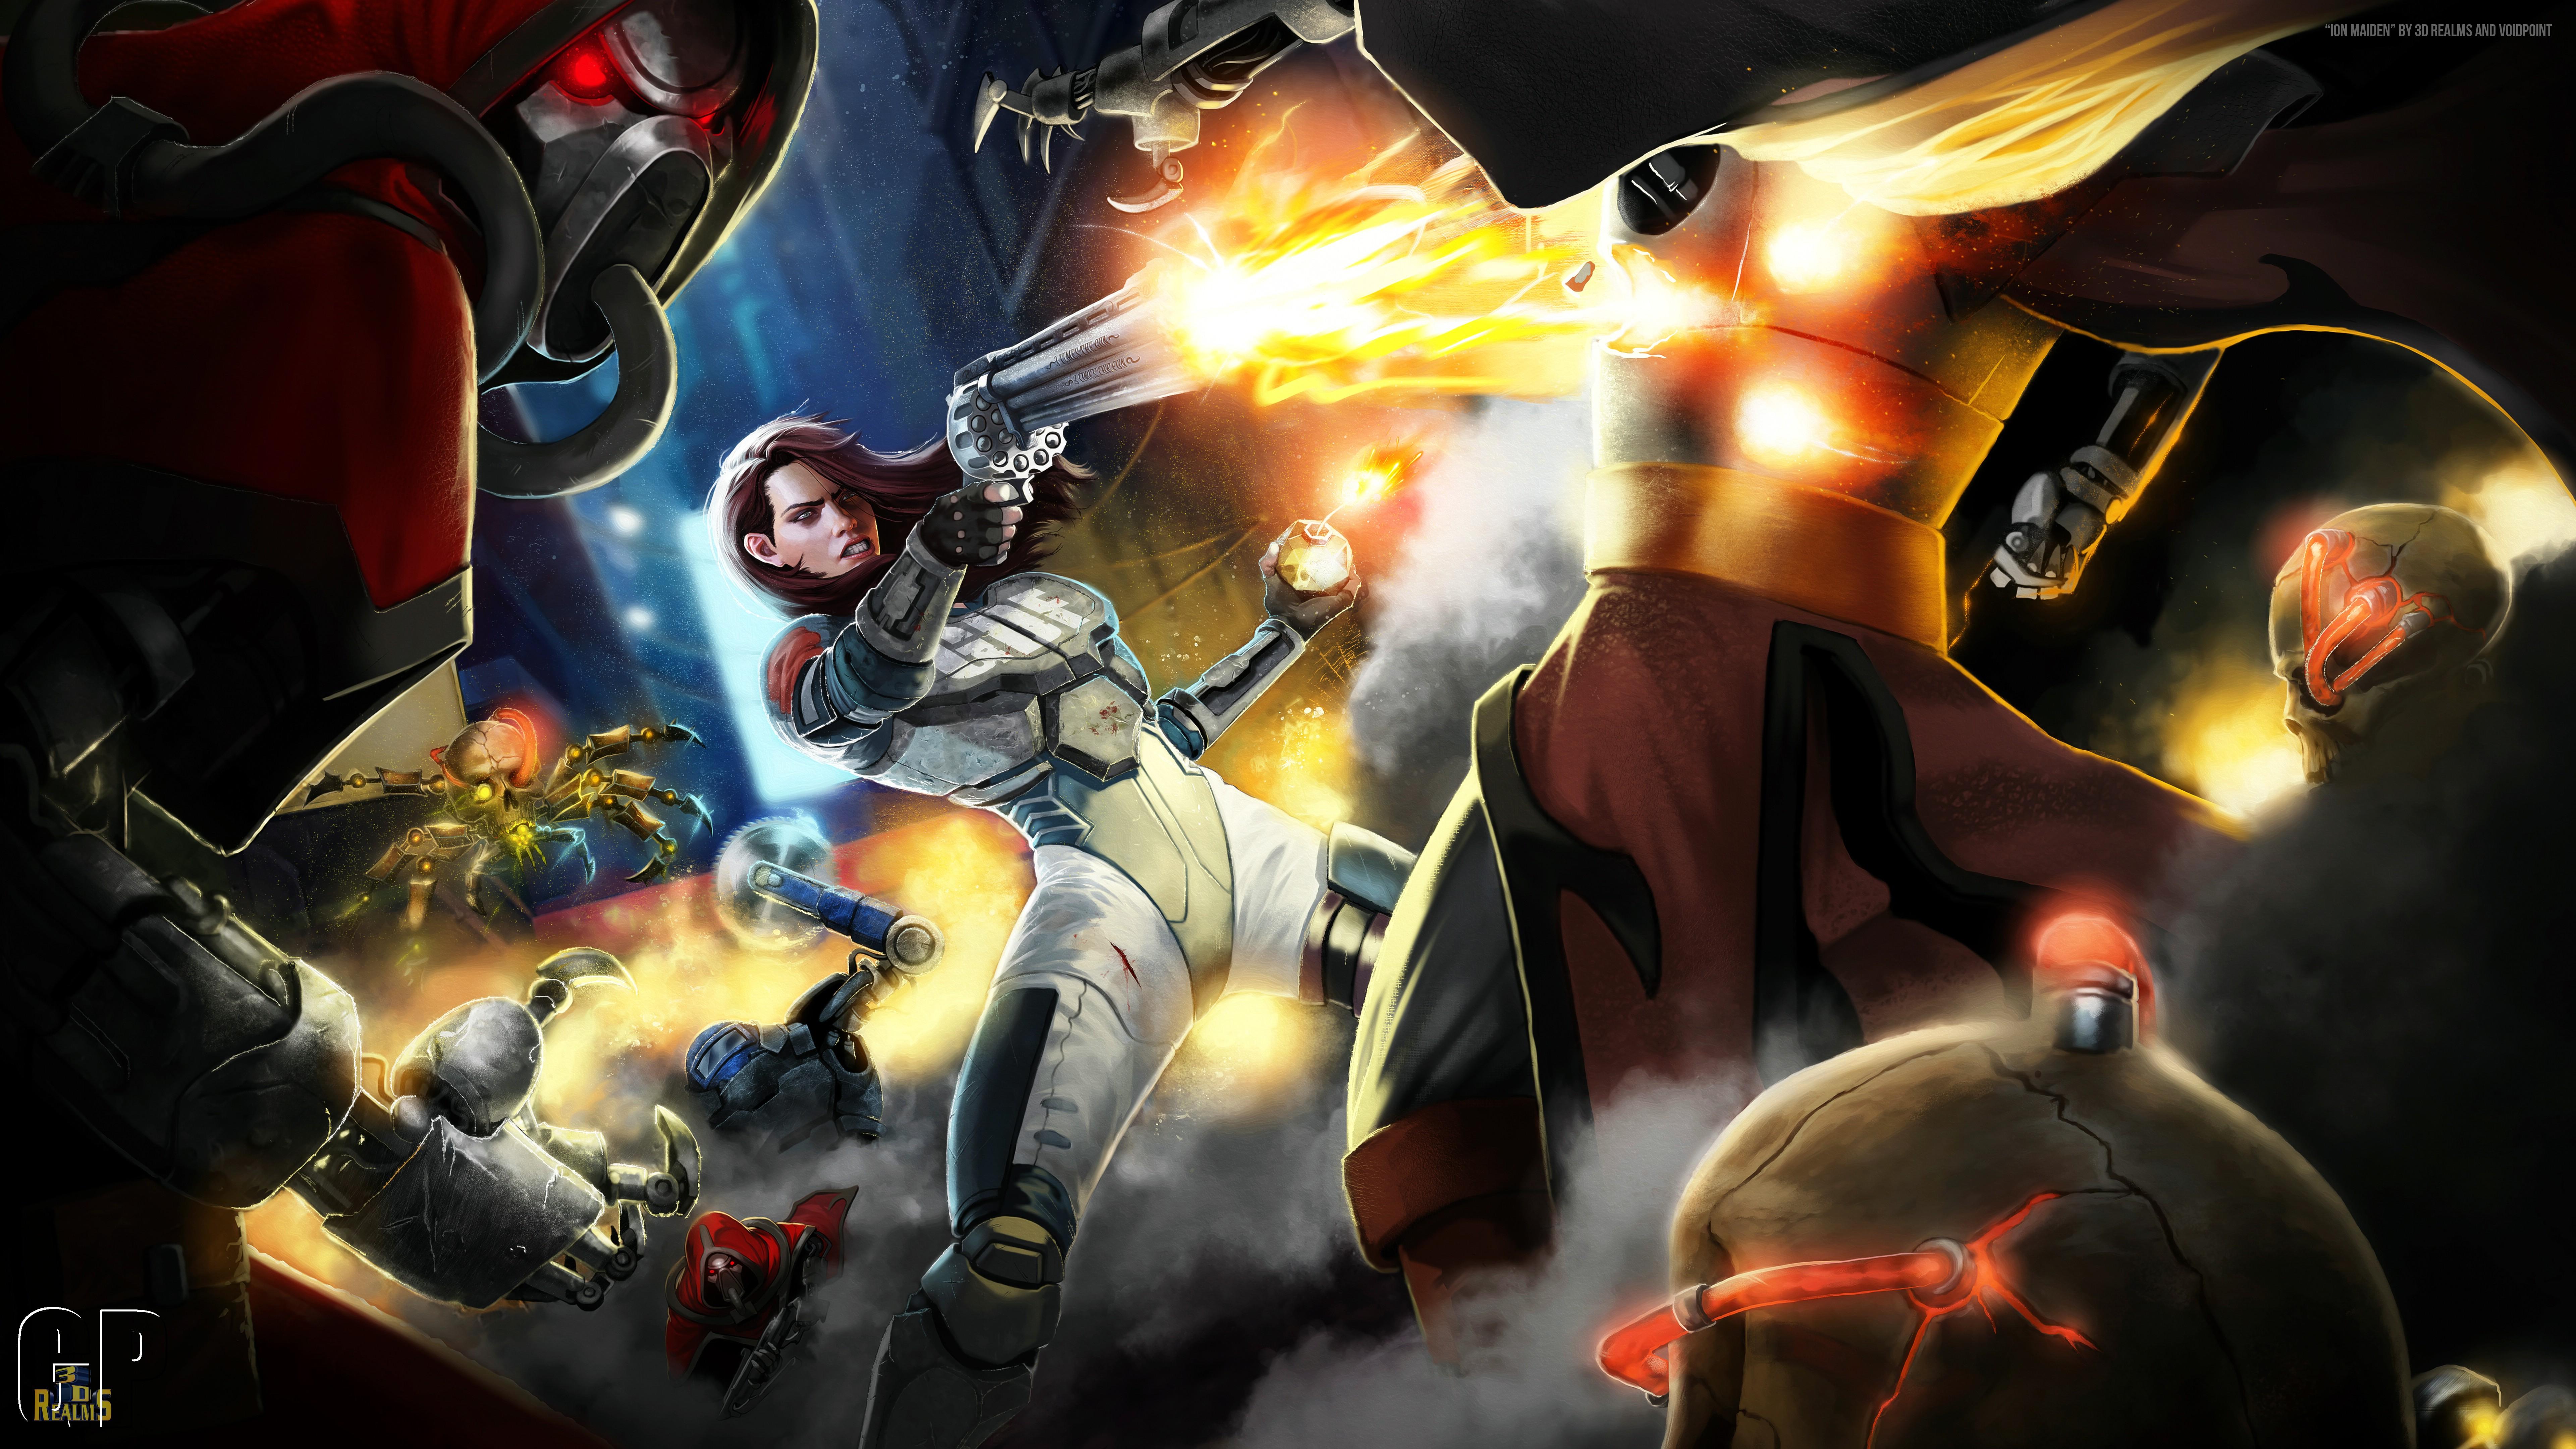 Holy Cow Duke Nukem Creators 3D Realms Have A New Build Engine FPS Out